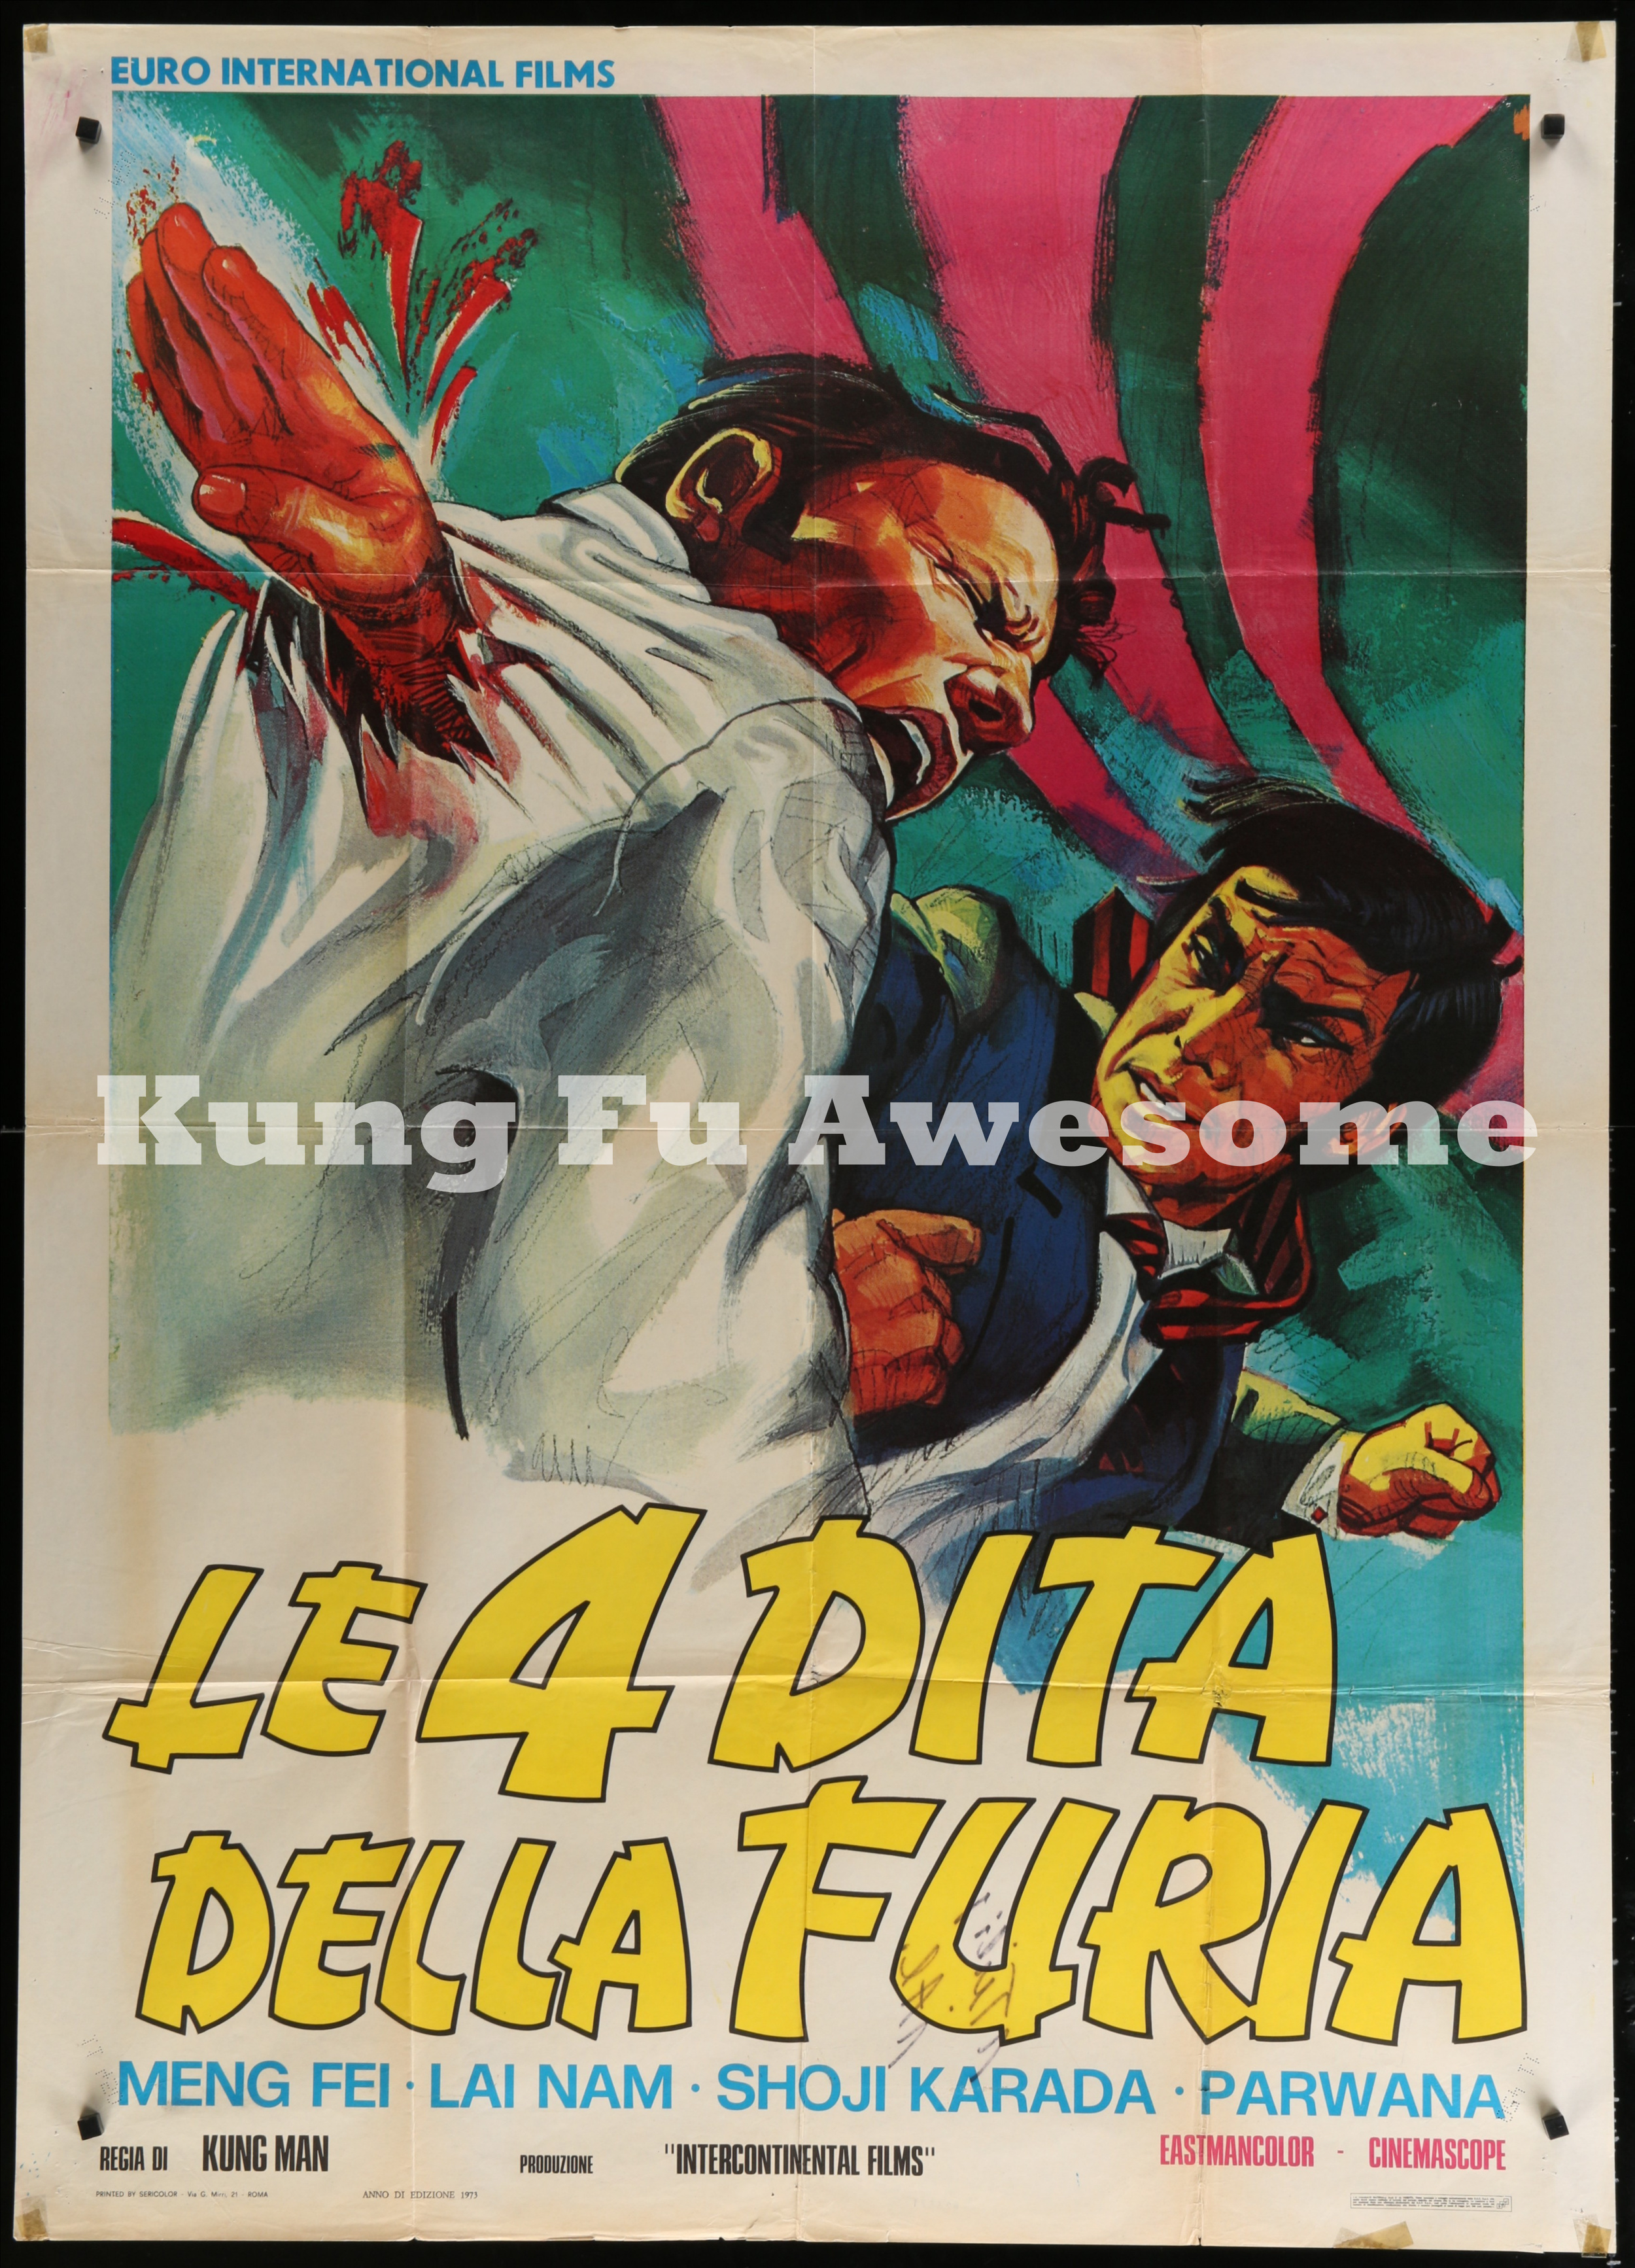 italian_1p_hands_of_death_JC10402_L.jpg